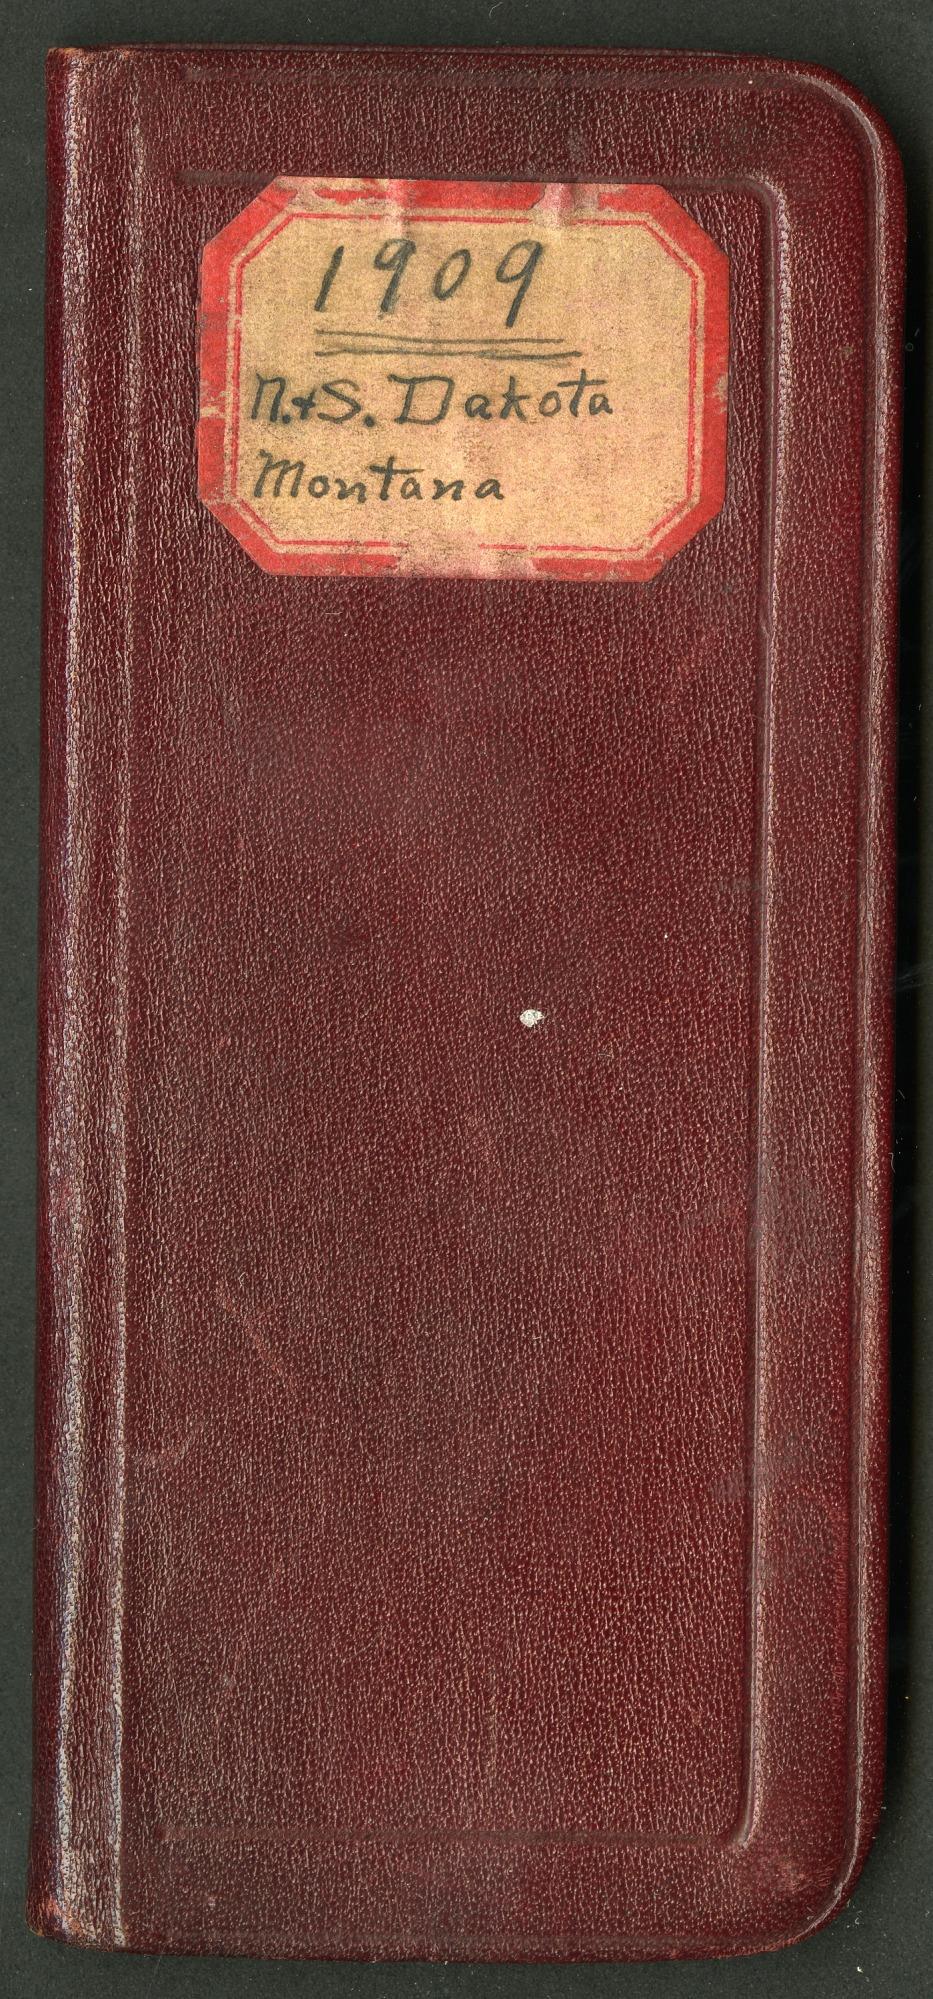 Field notes, North Dakota, South Dakota, and Montana, July 9-August 18, 1909